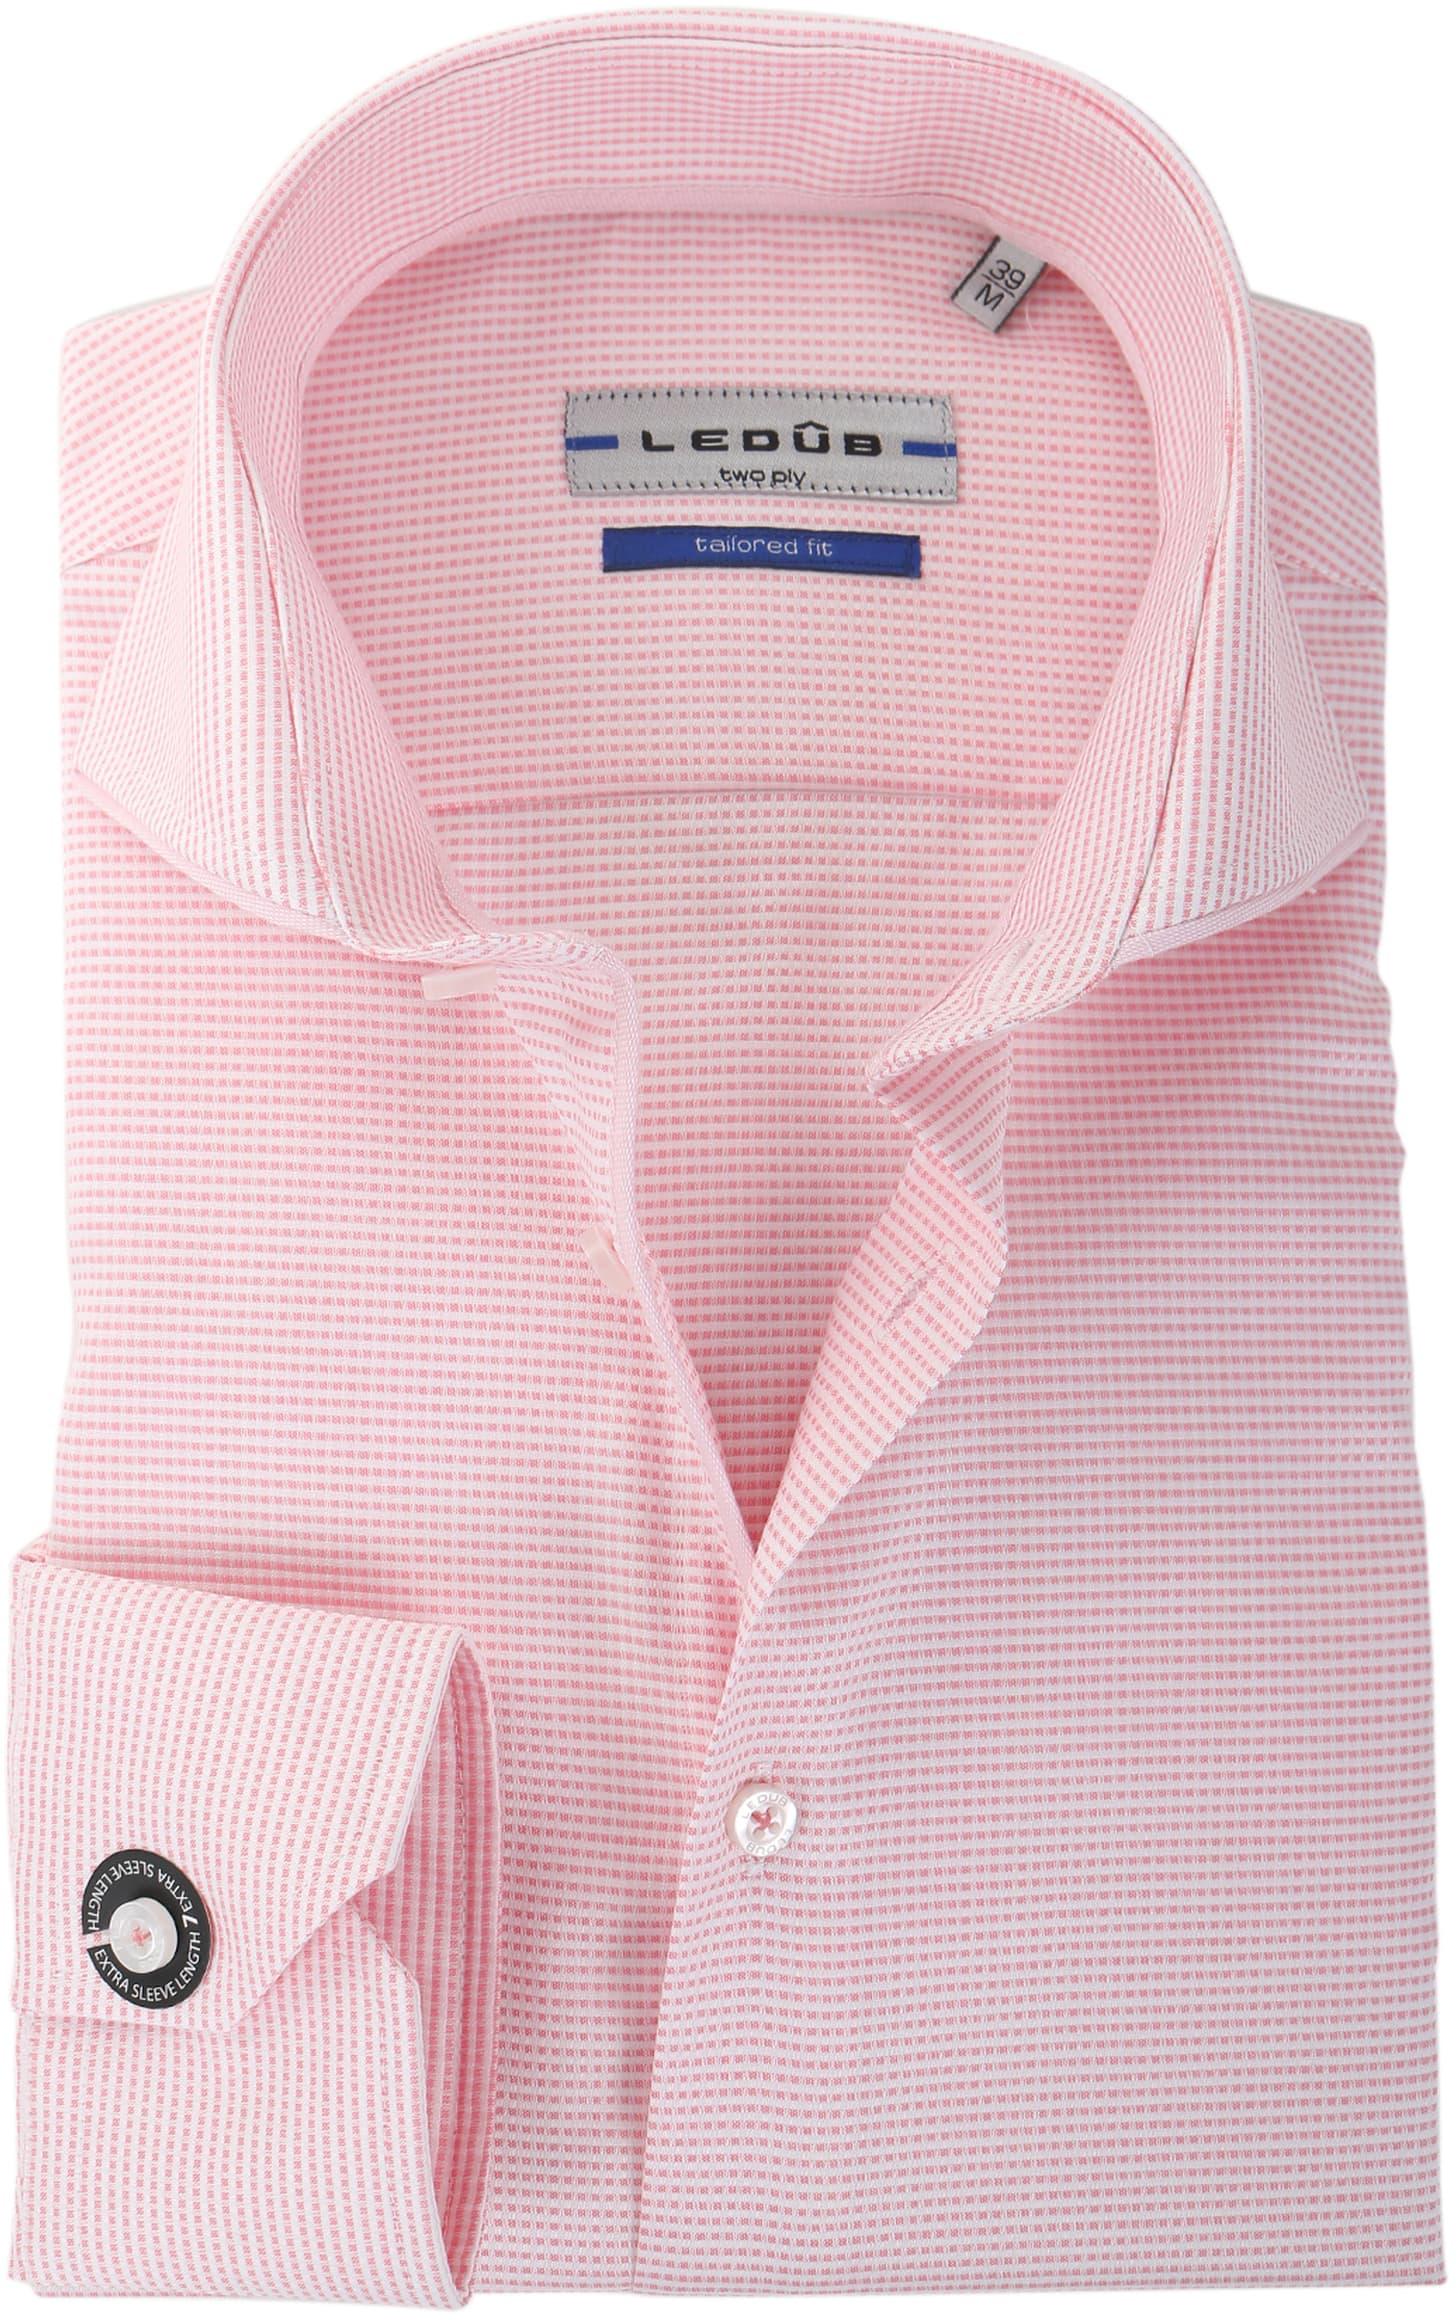 Roze Overhemd.Ledub Overhemd Roze Wit Ruit Sl7 135880 Online Bestellen Suitable